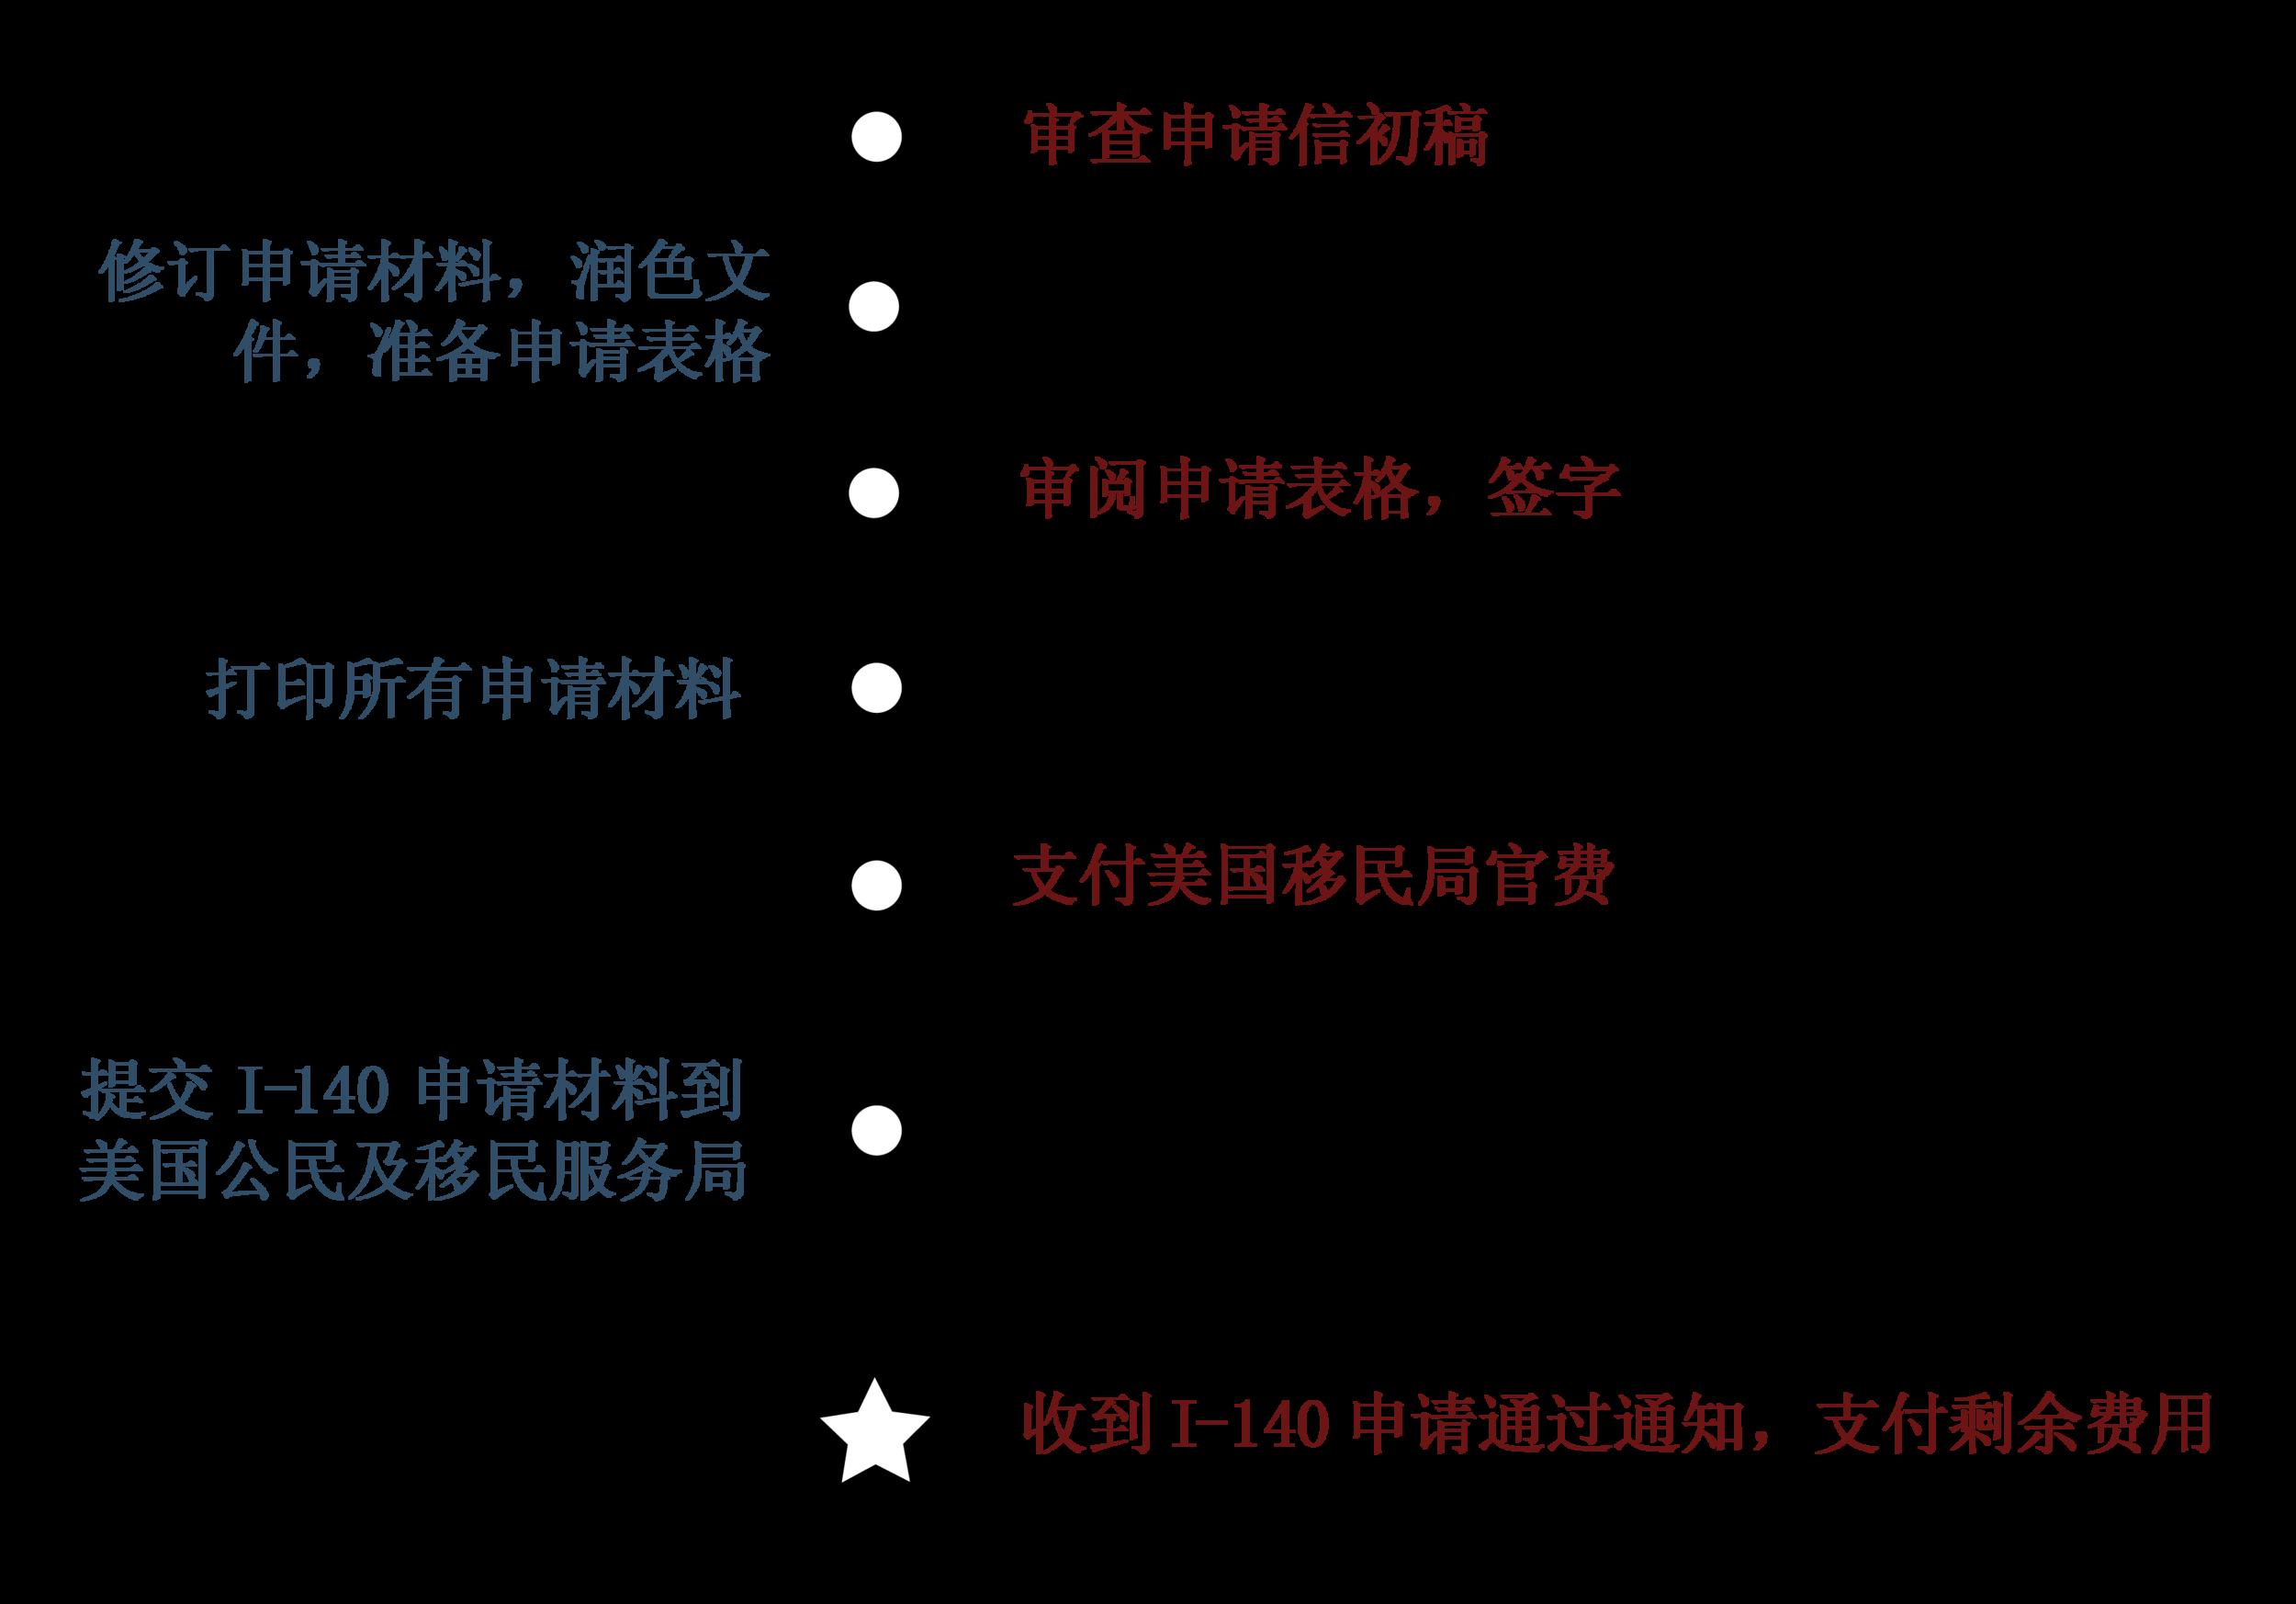 nwm process diagrams-03.png